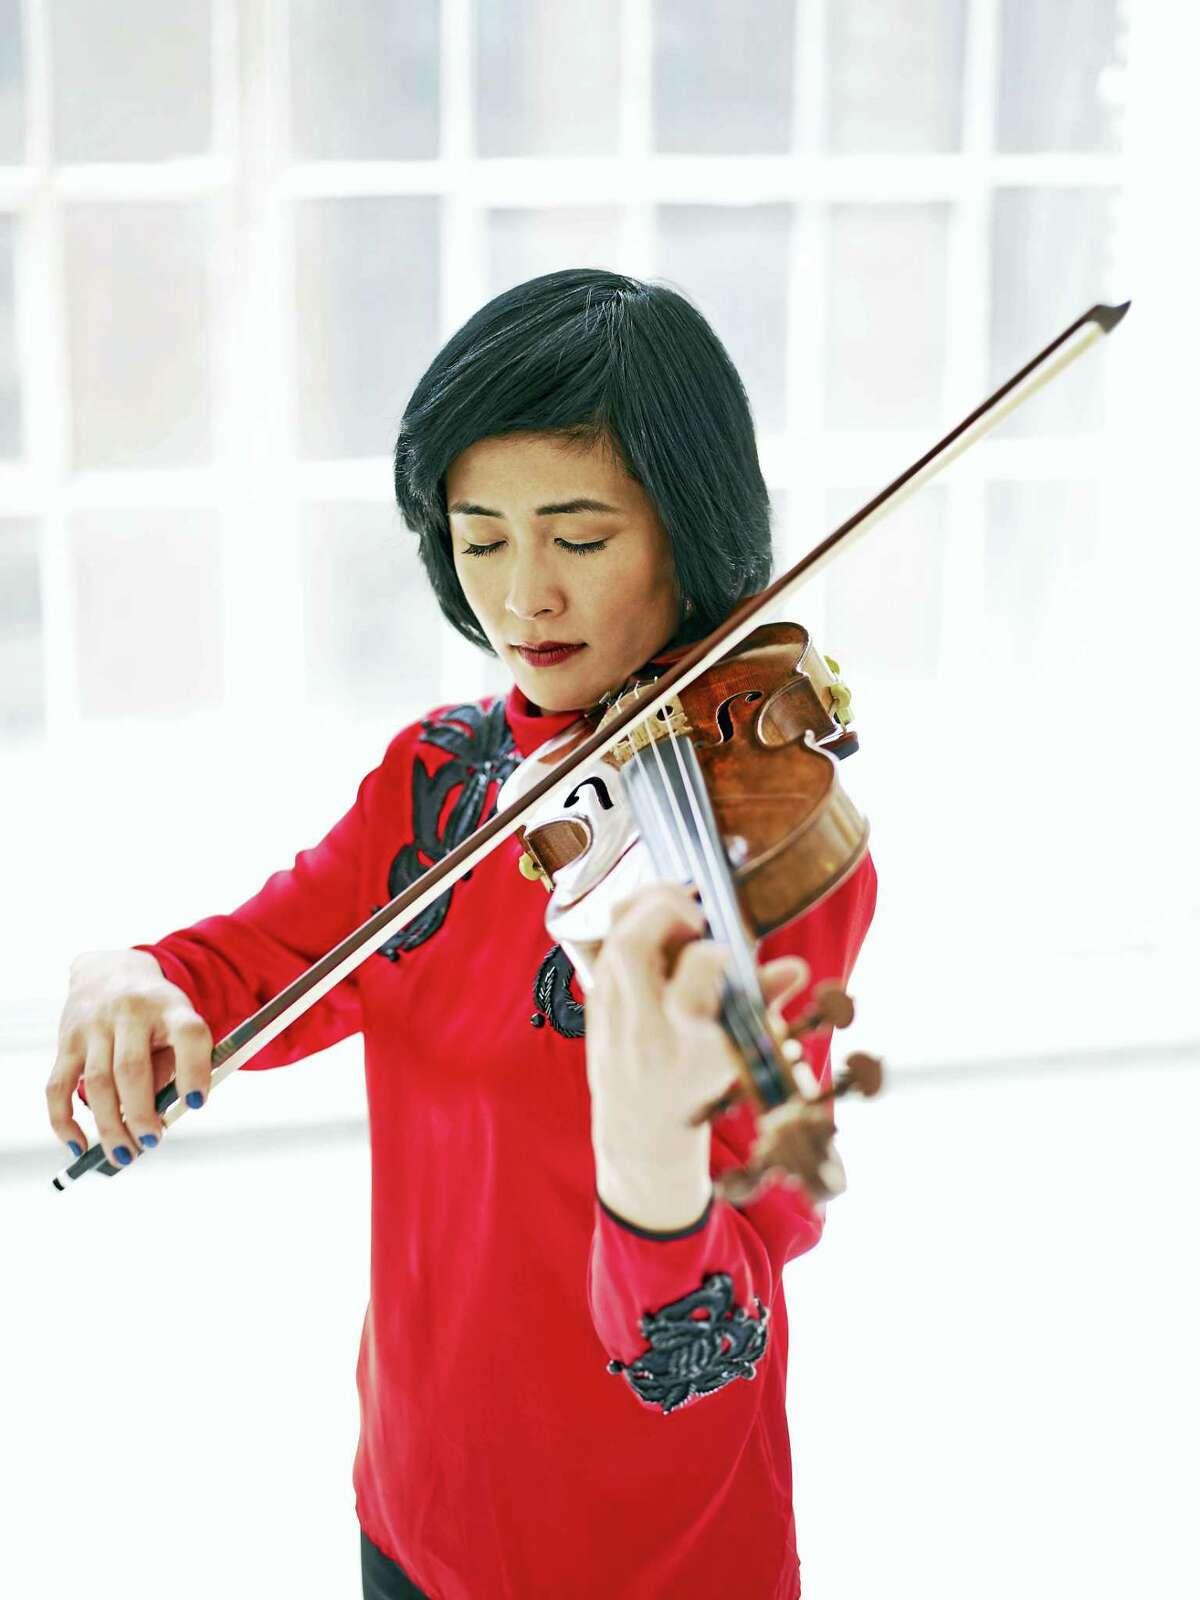 Violinist Jennifer Koh, photographed in New York City.